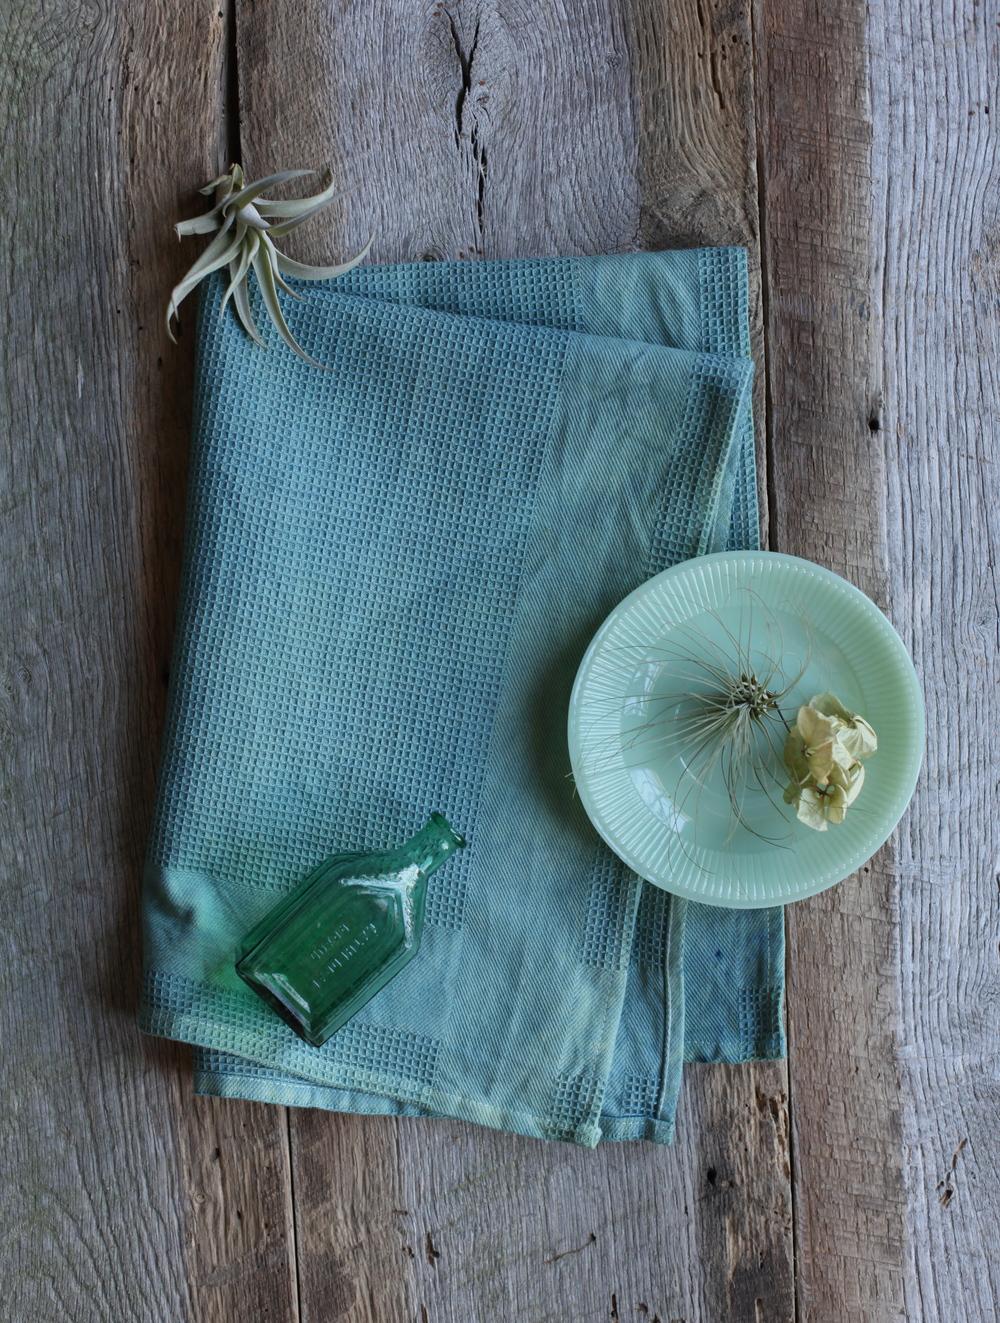 Dewy Grass Tea Towel